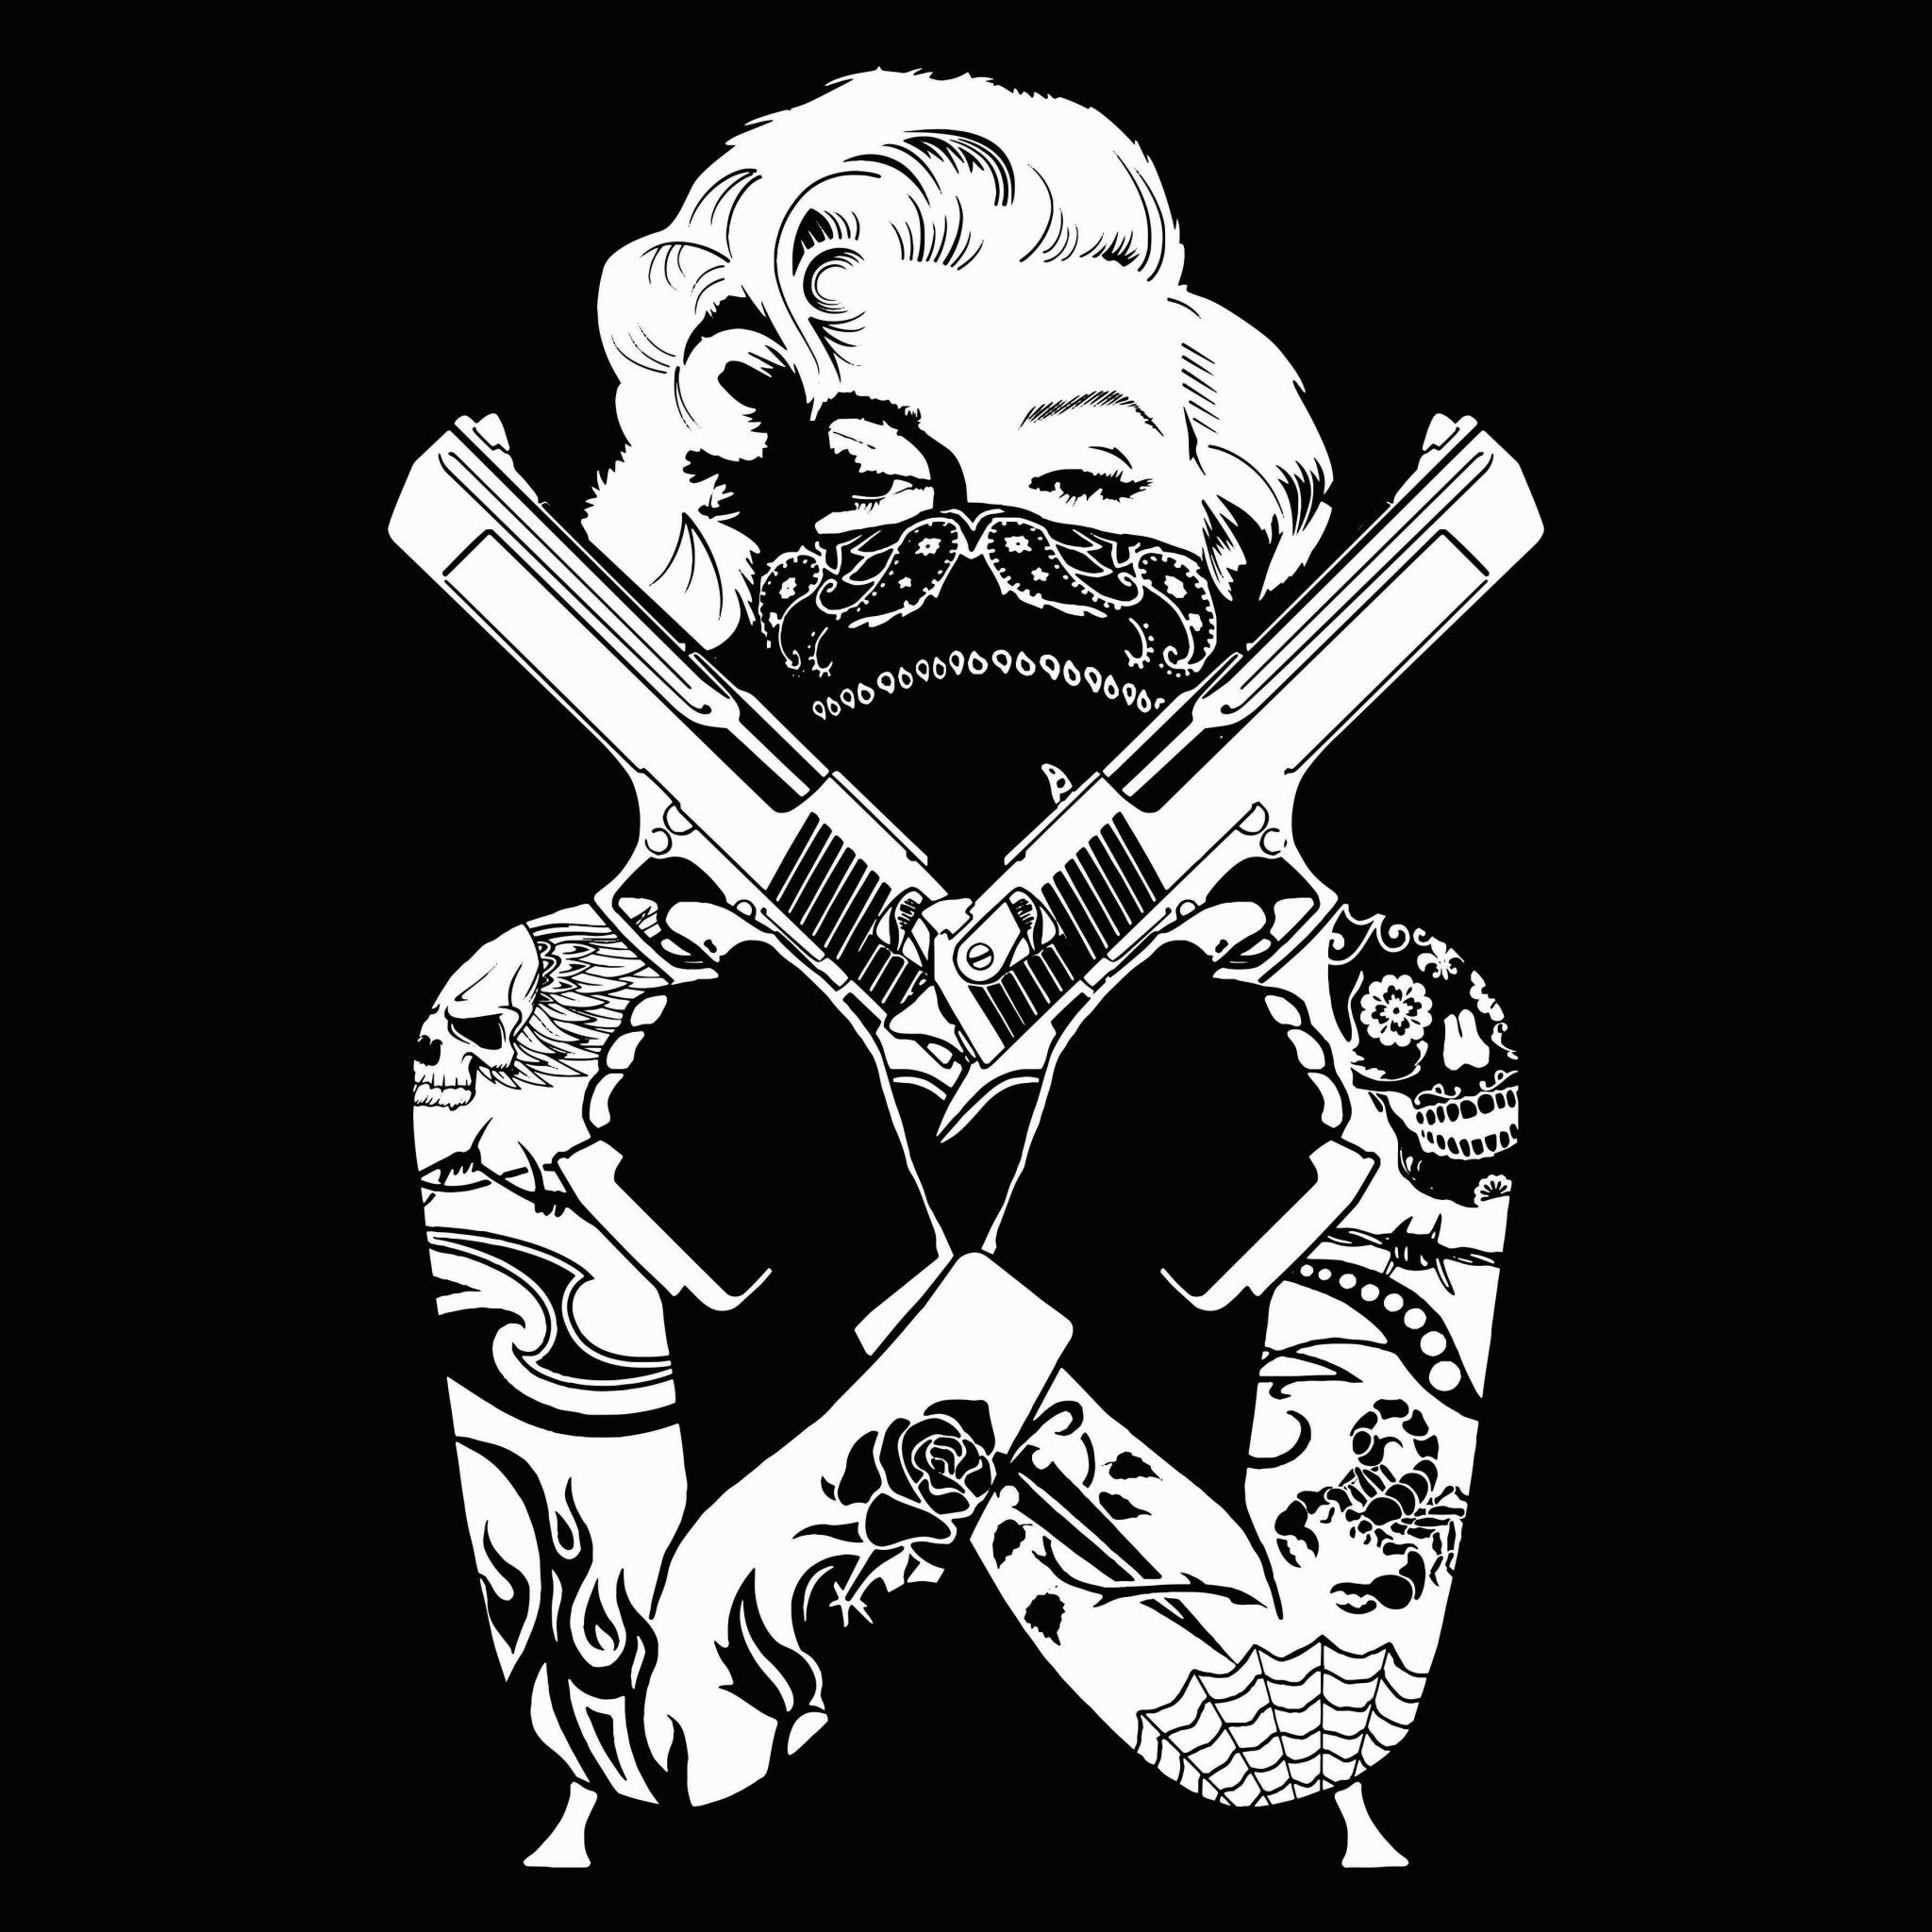 gangster wallpaper for computer Marilyn monroe tattoo